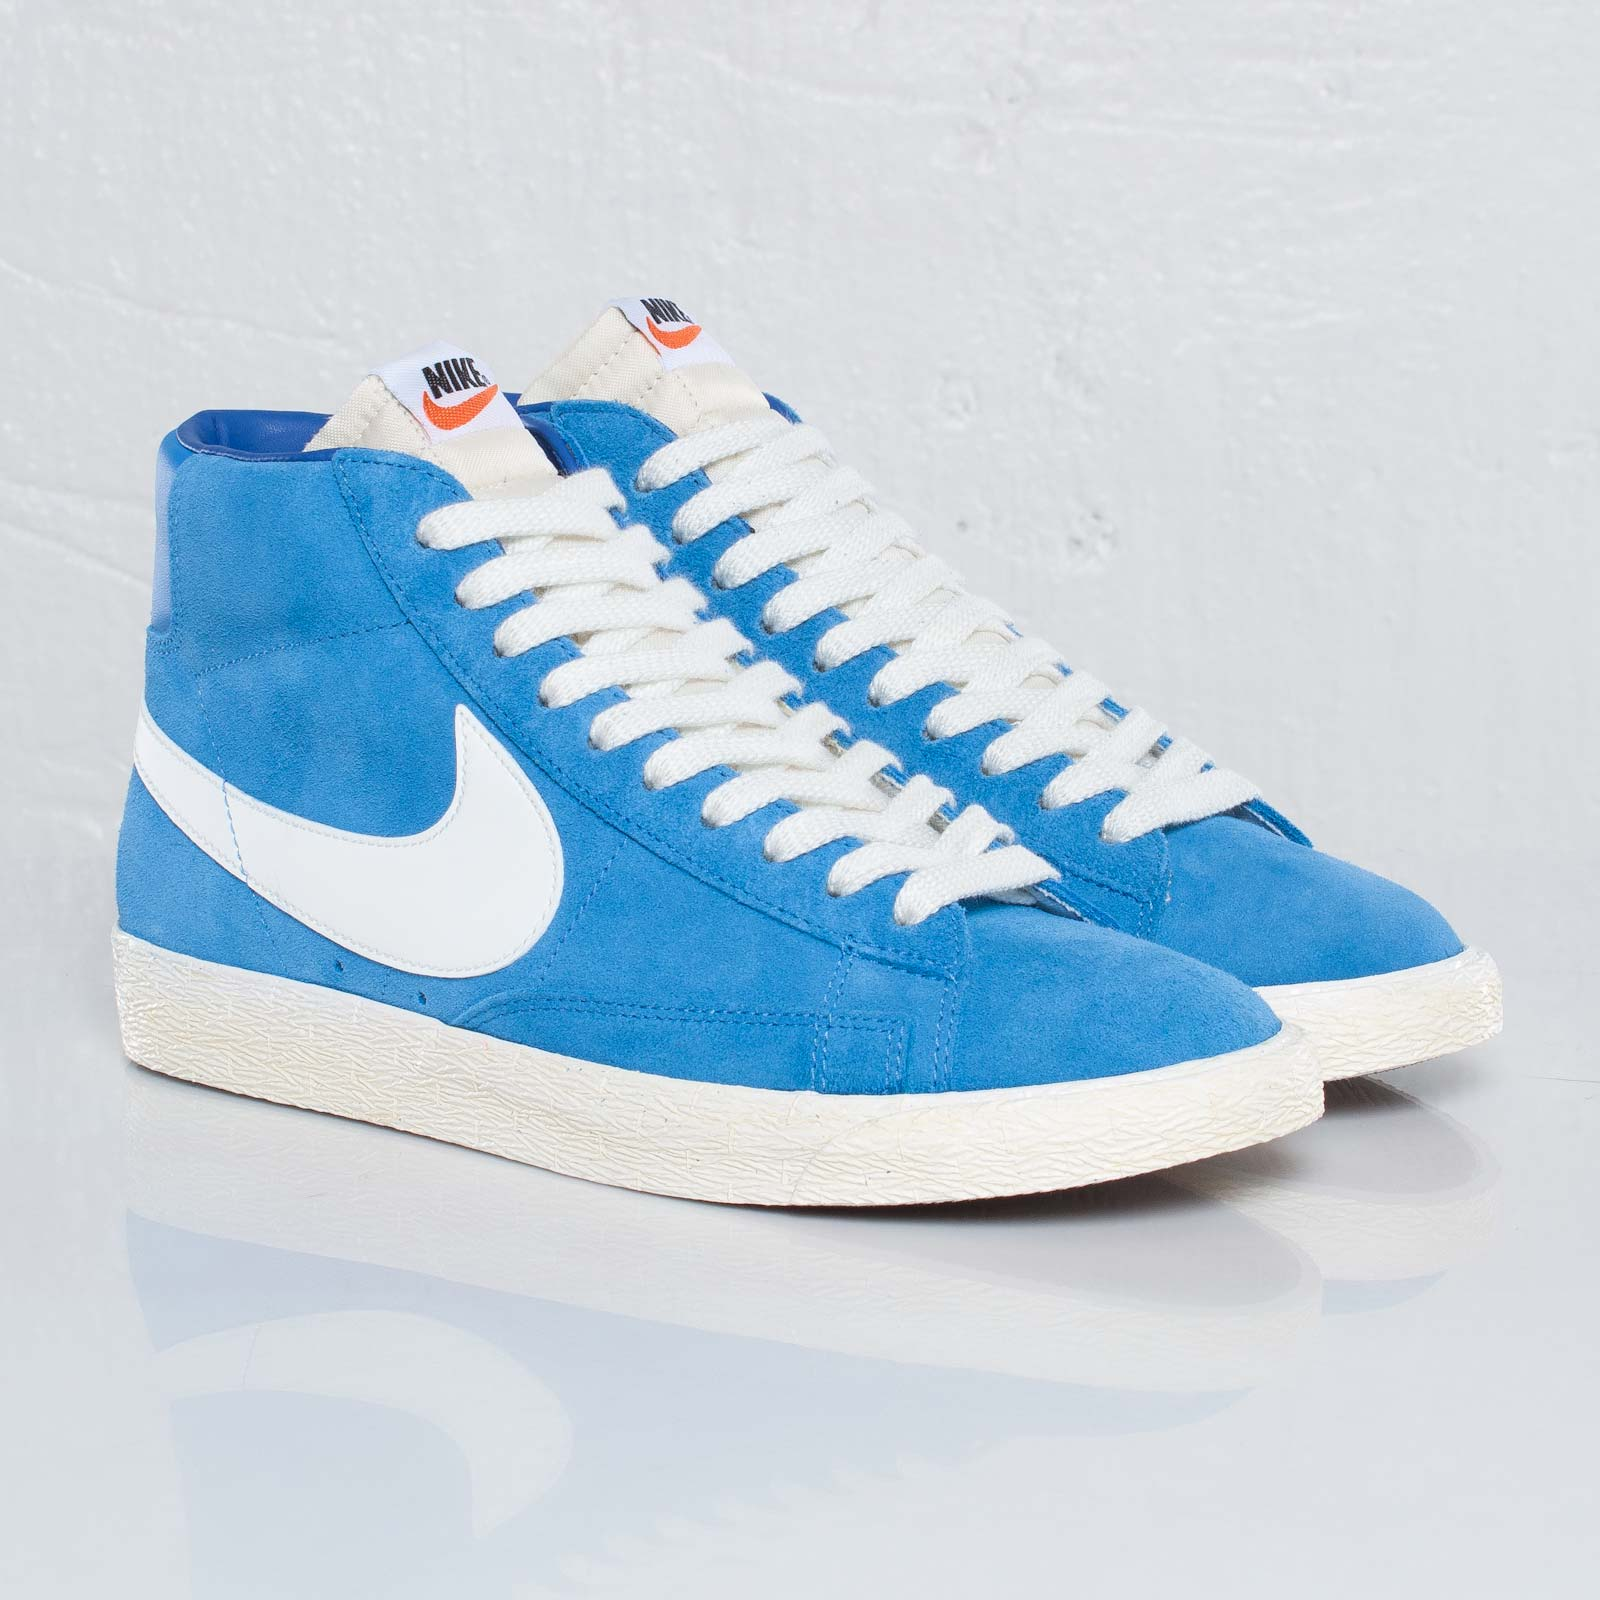 size 40 2397a 4171d Nike Blazer Hi Suede Vintage - 110107 - Sneakersnstuff ...